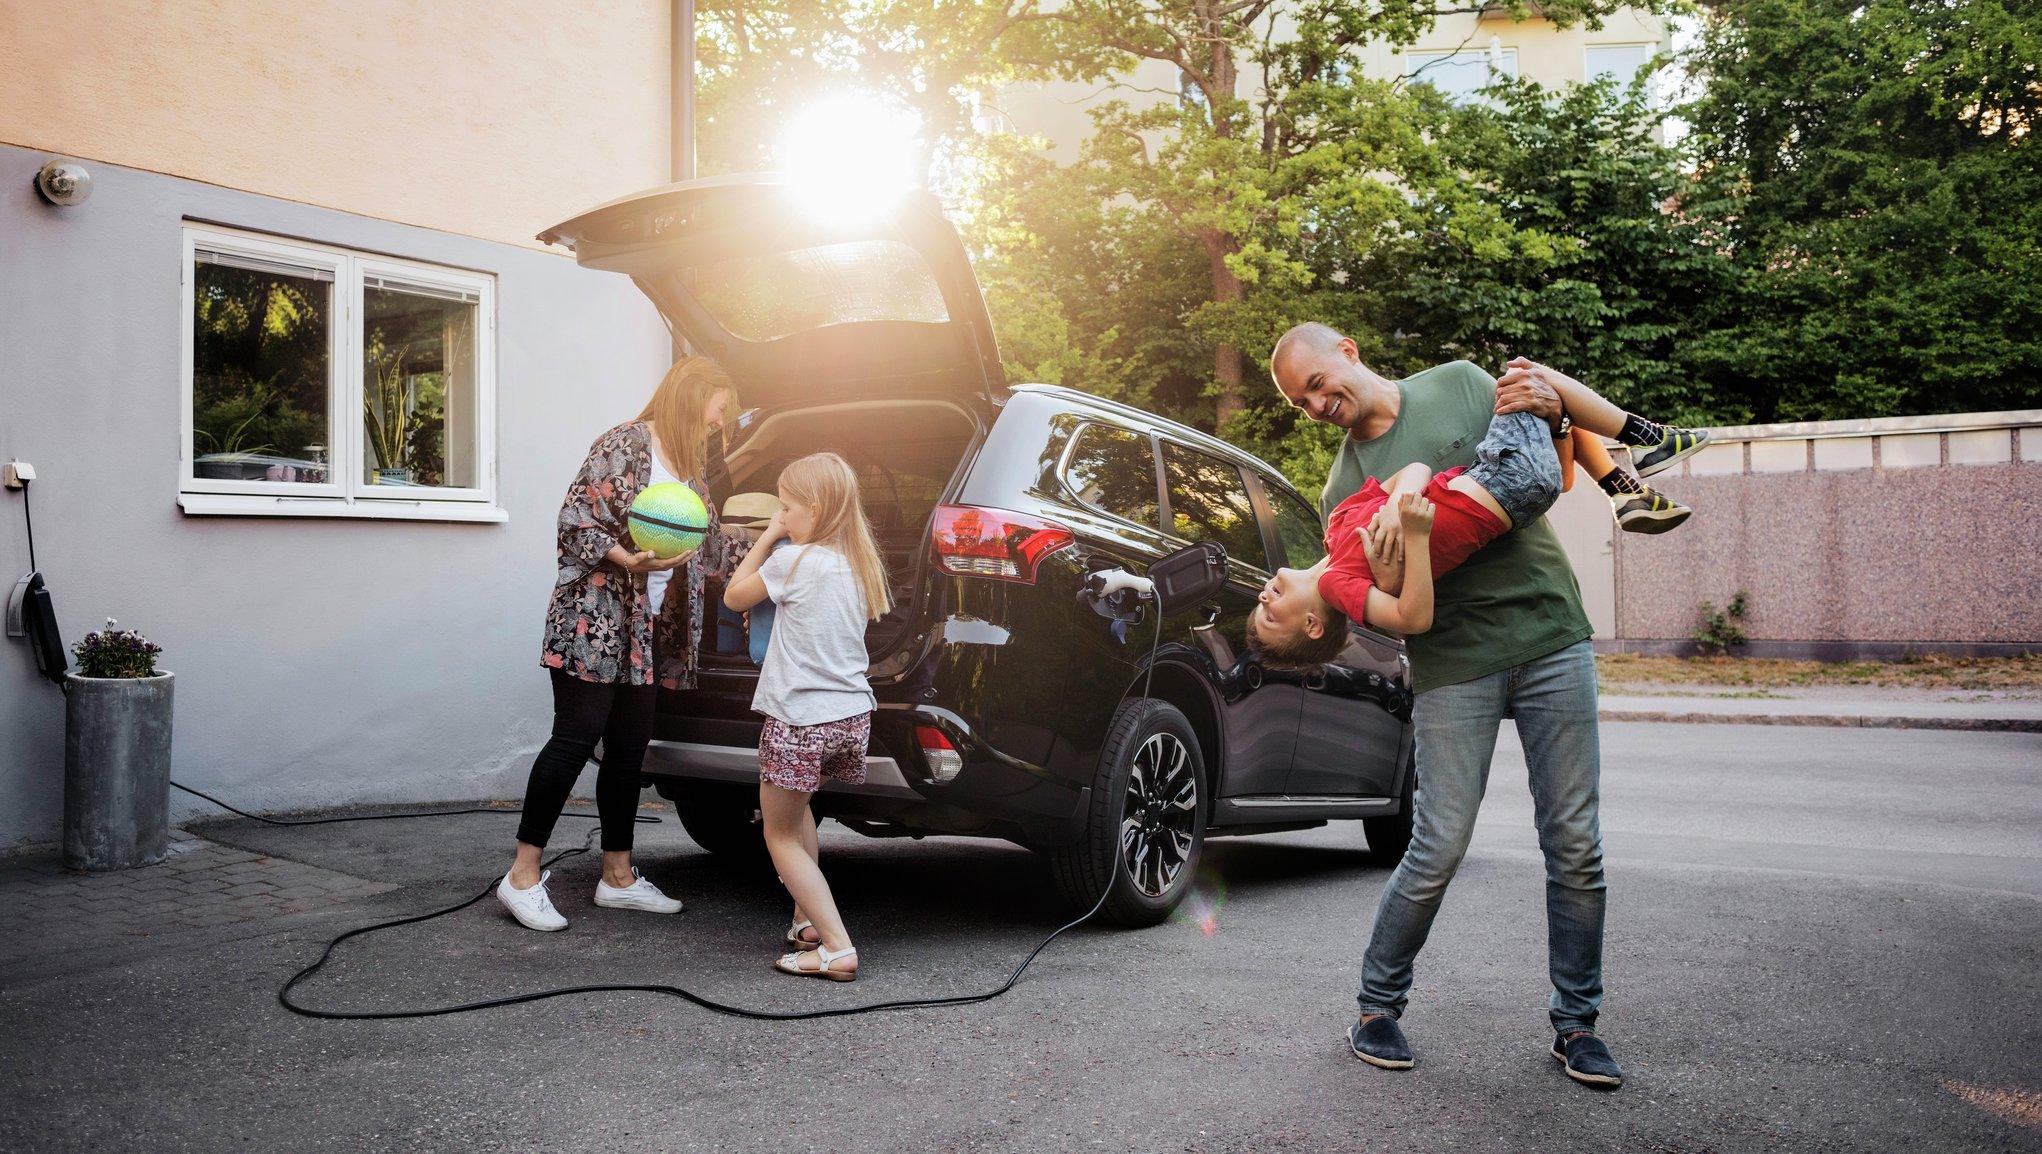 Perhe pakkaa autoa